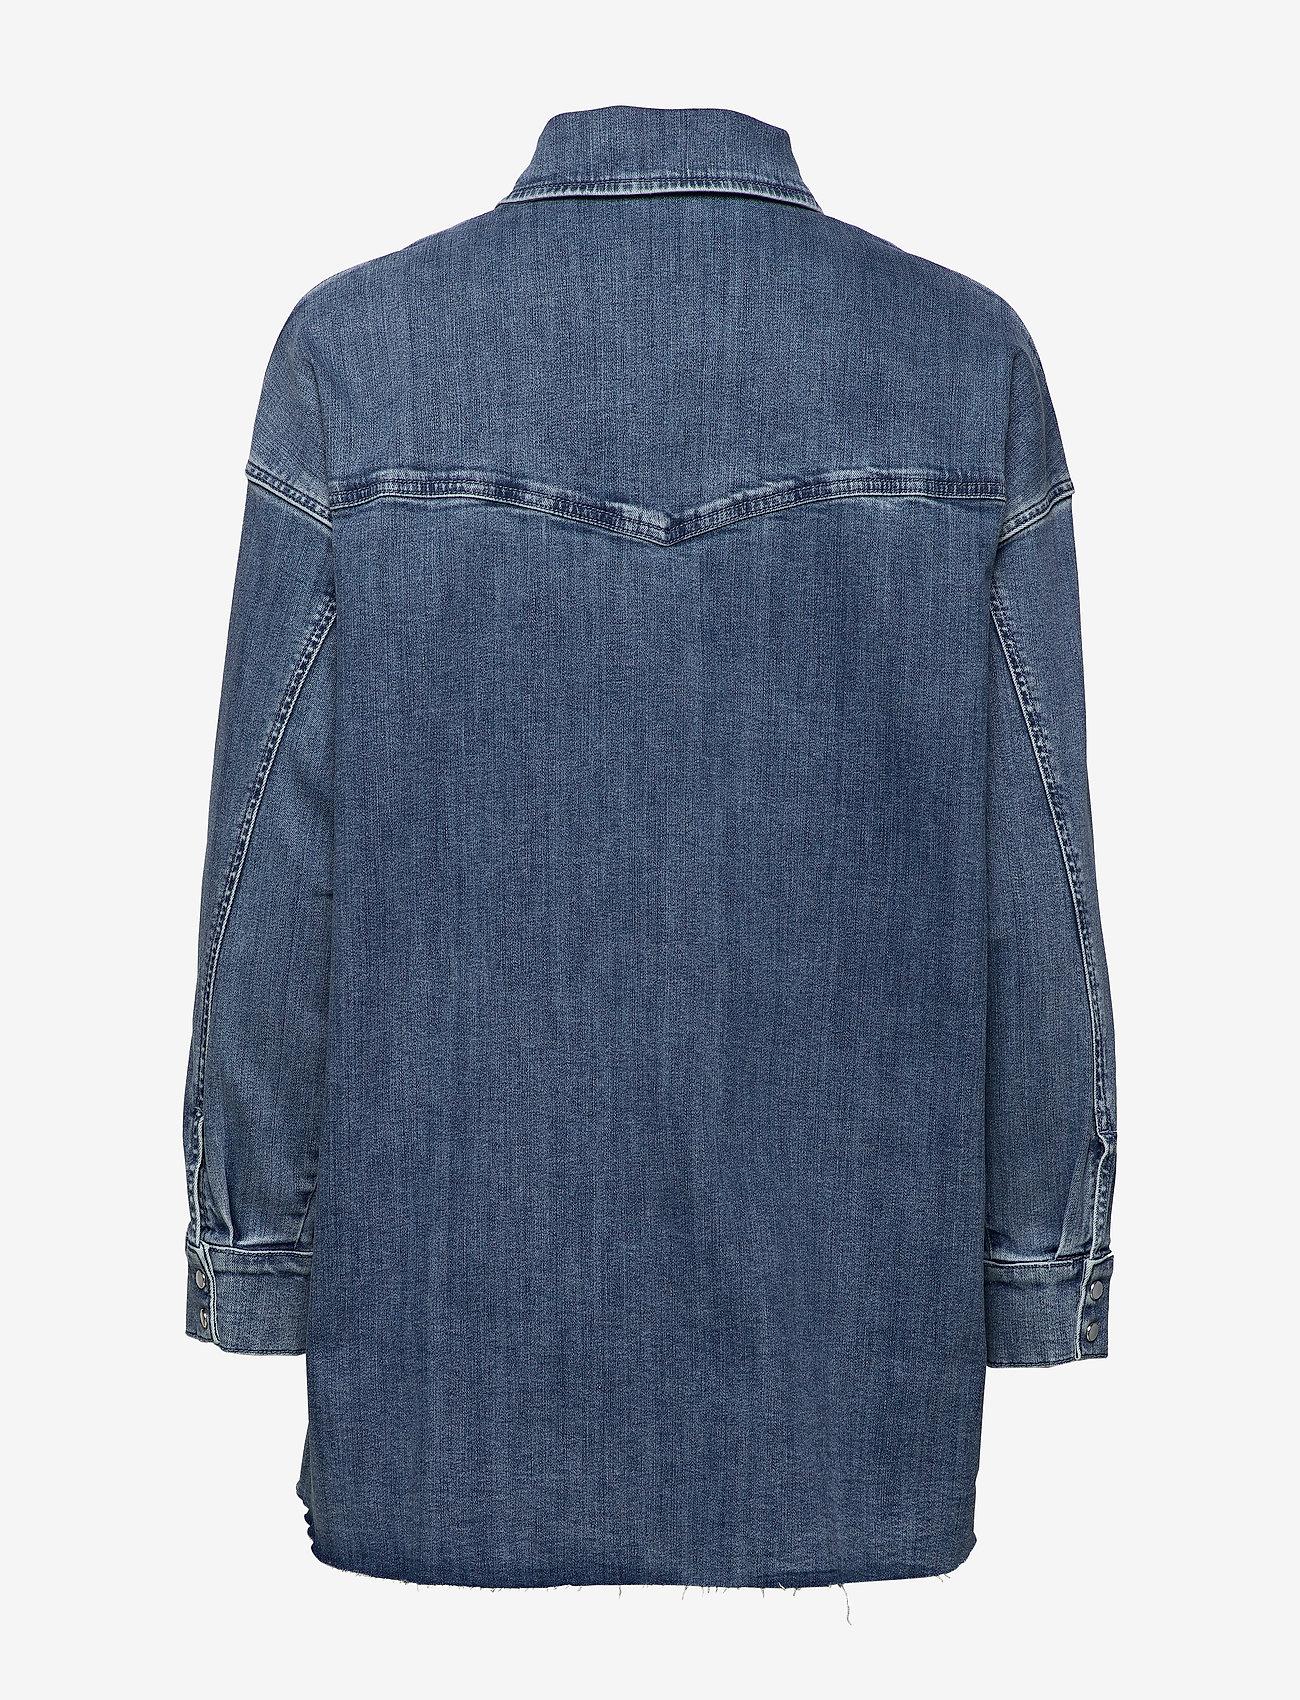 Phoenix Denim Shirt (Blue Wash) - Notes du Nord 3aKFoA